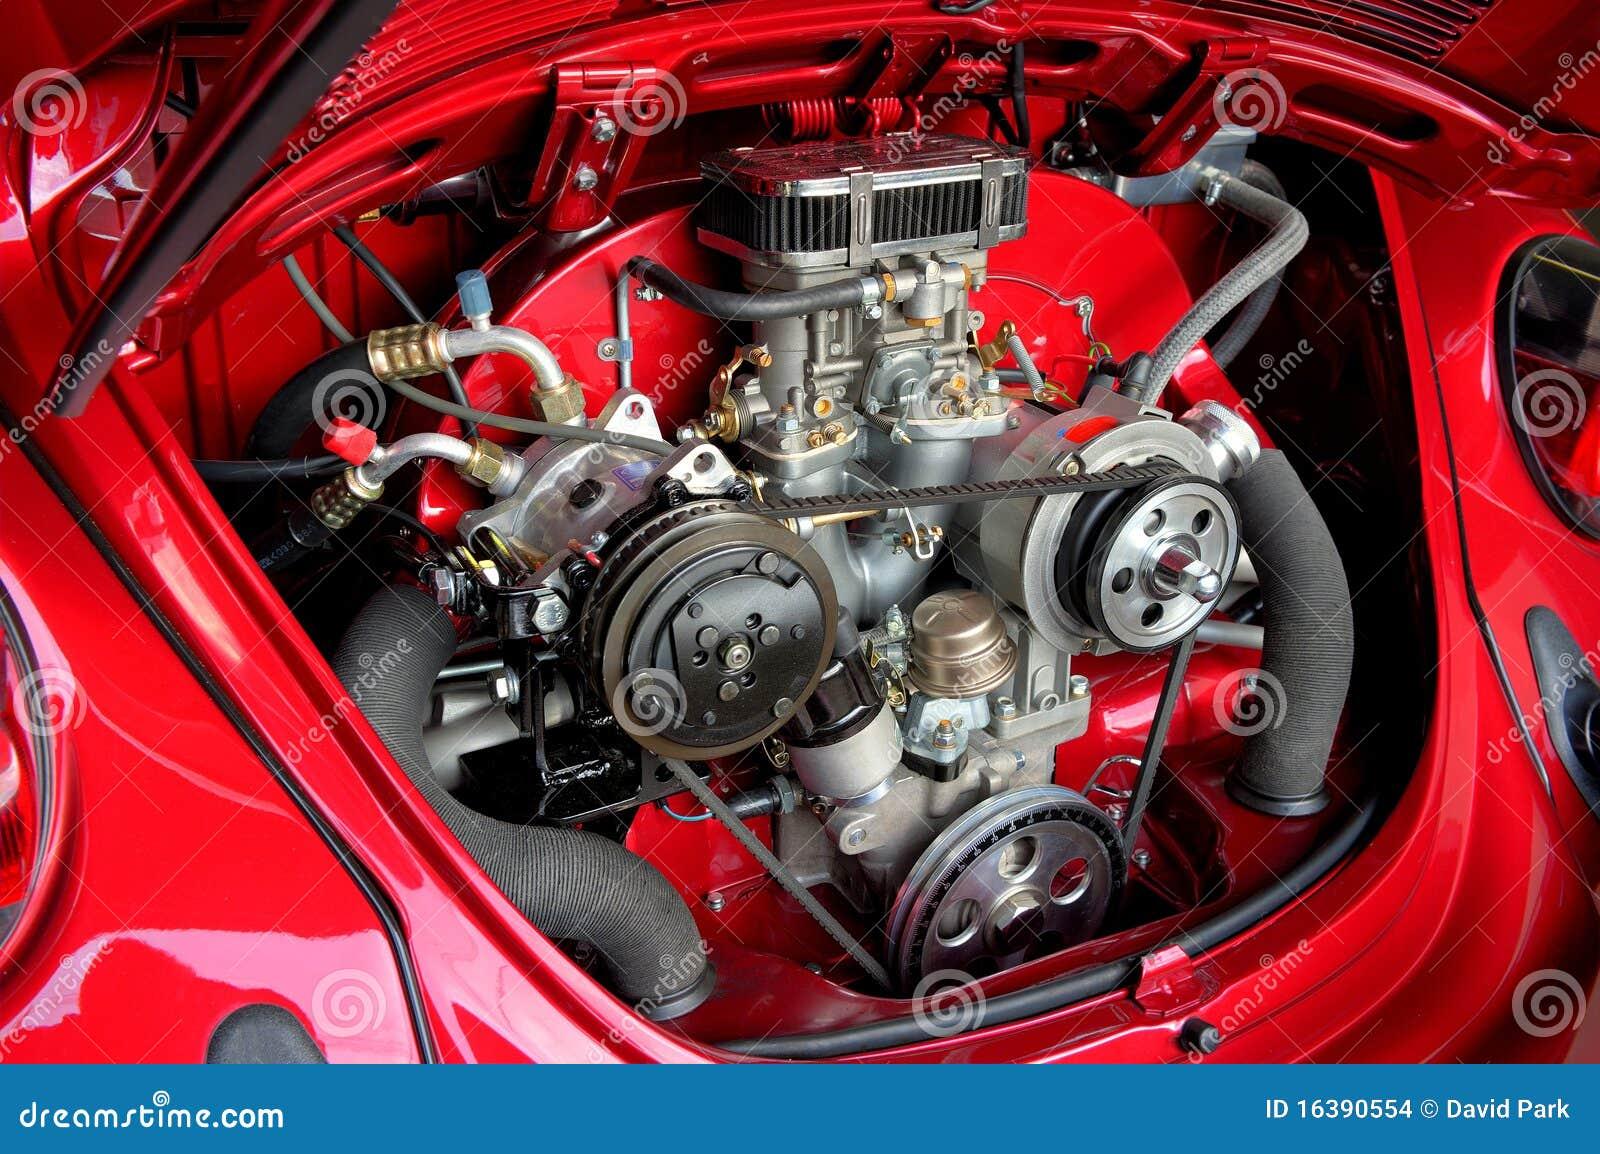 Motor Refrigerado De Vw on 1974 Vw Super Beetle Engine